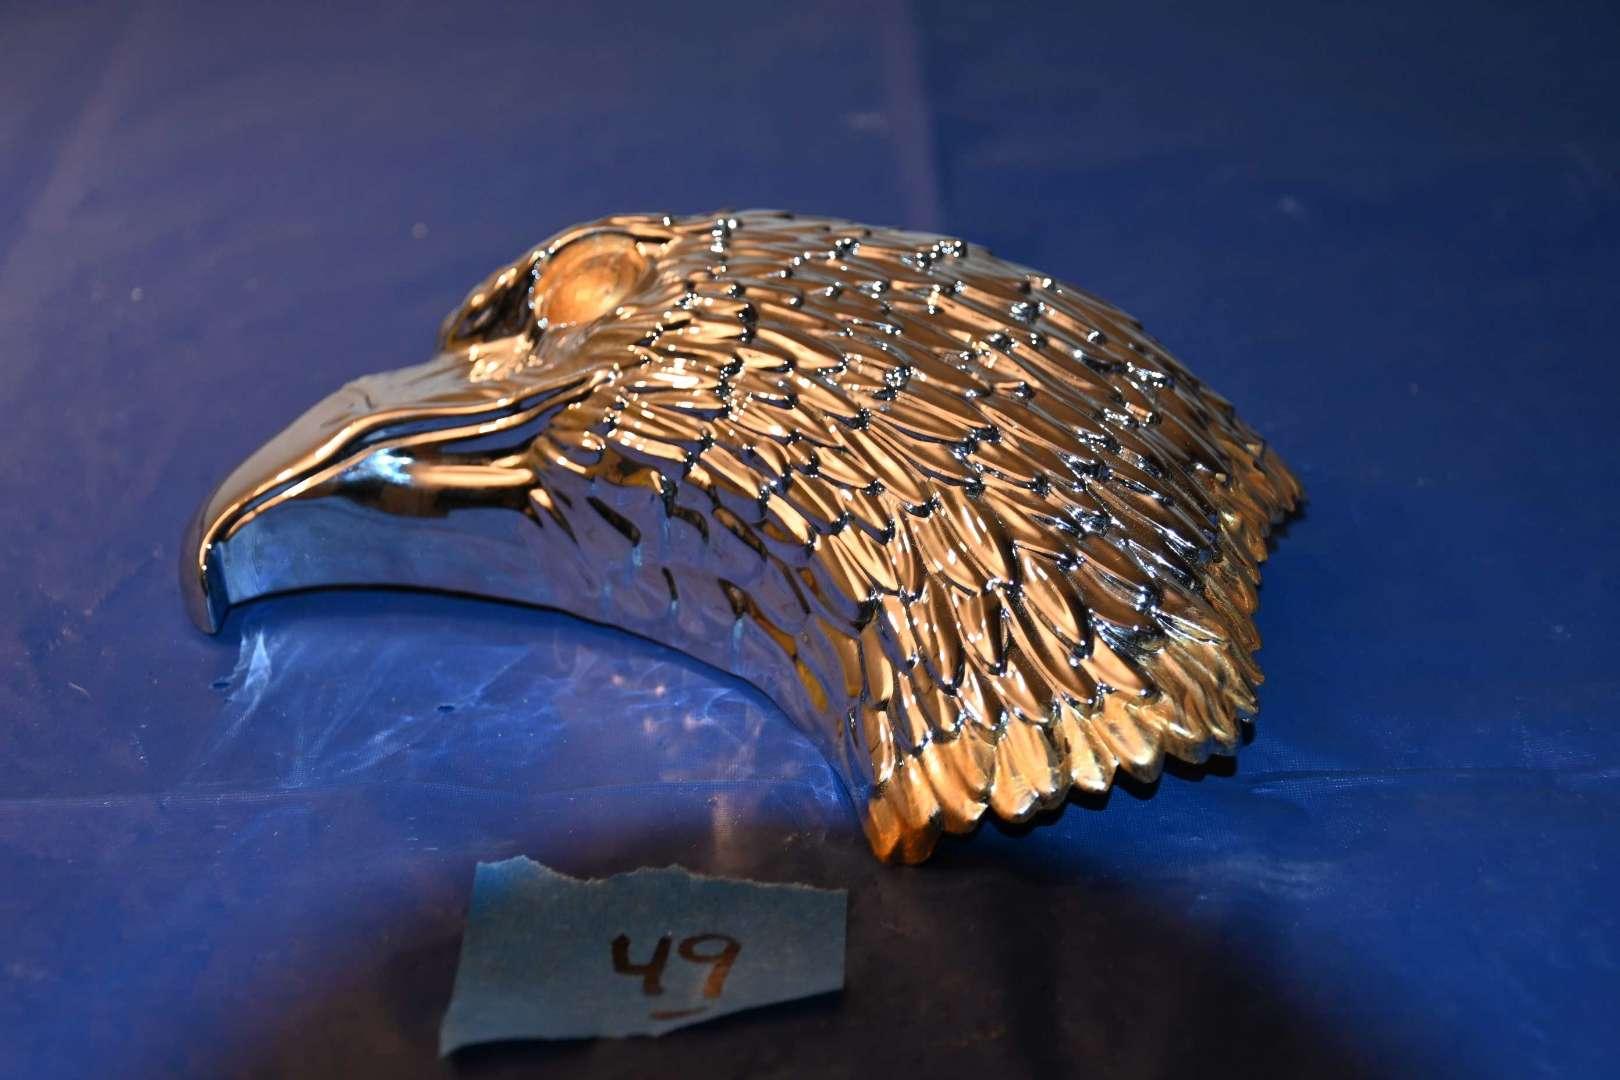 Lot # 49 Harley Davidson chrome eagle head